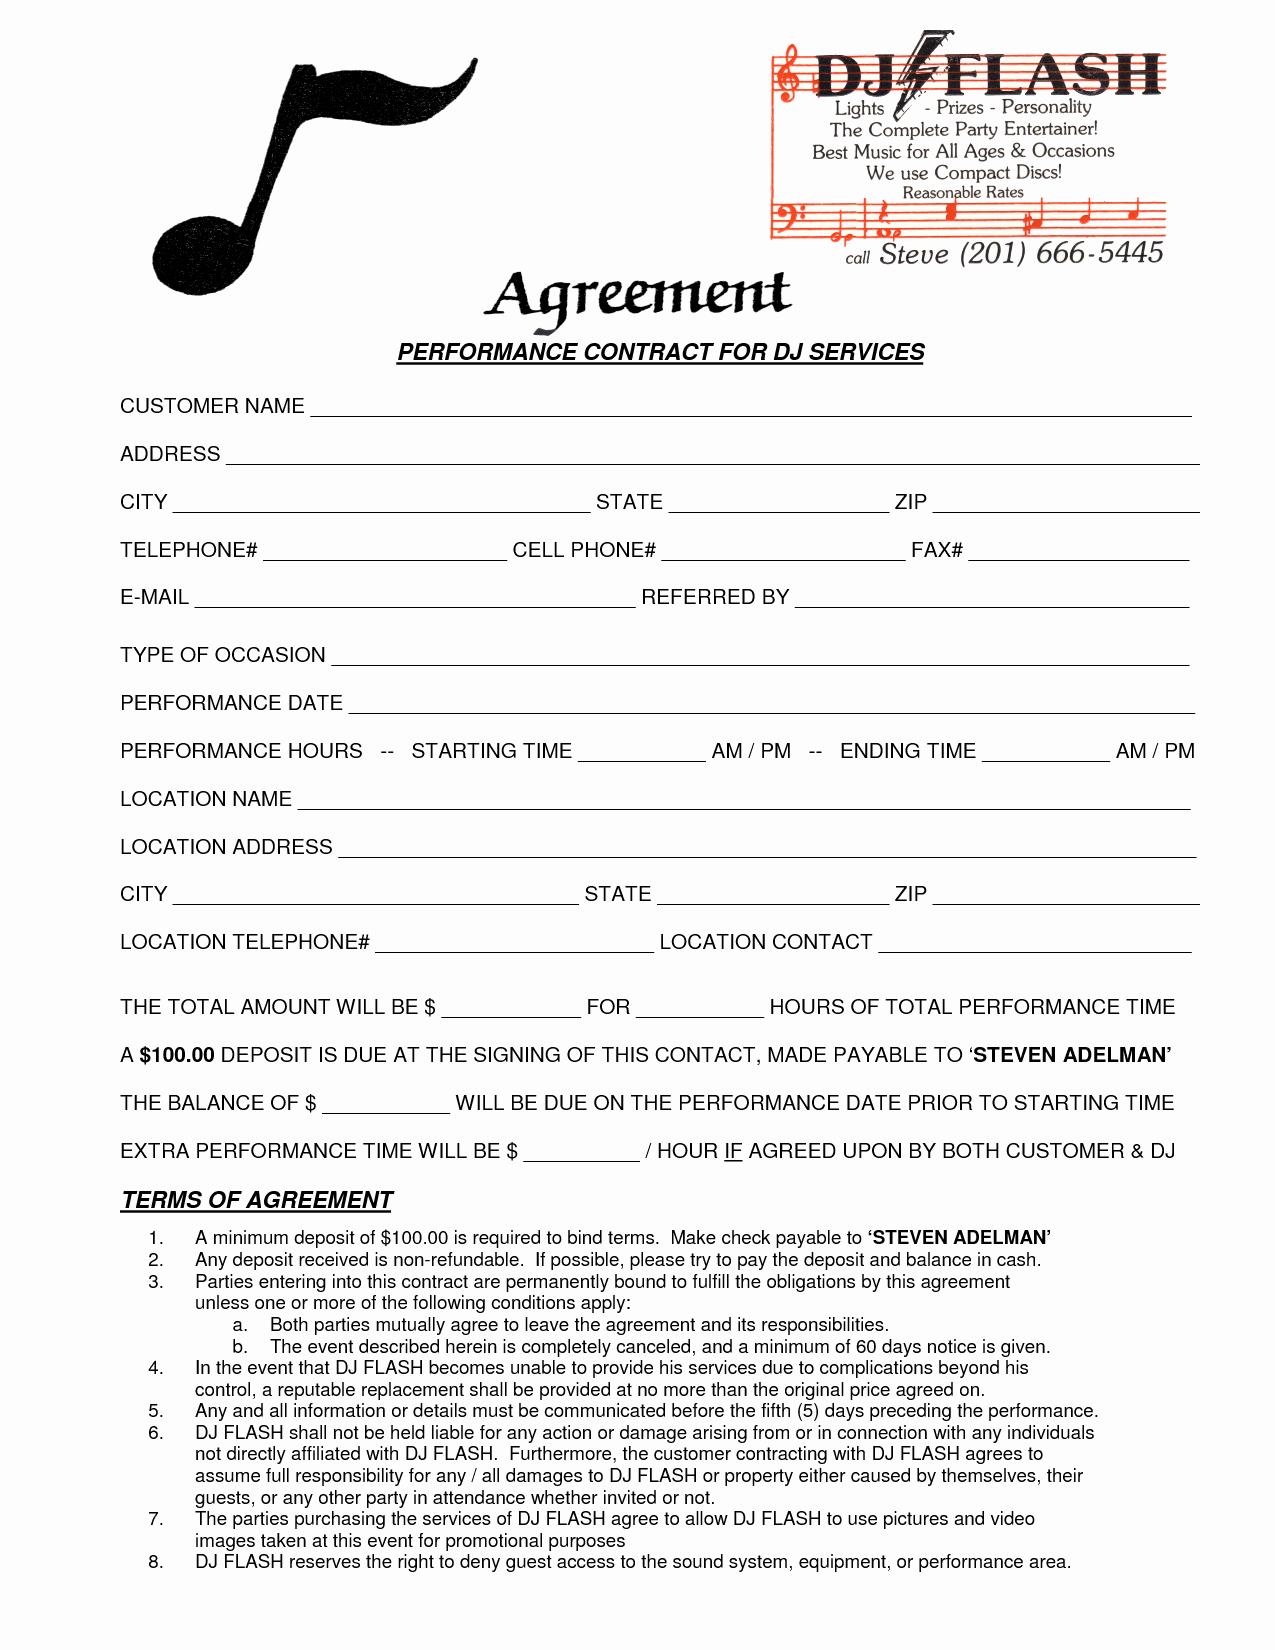 9 Best Of Dj Contract Agreement Template Dj